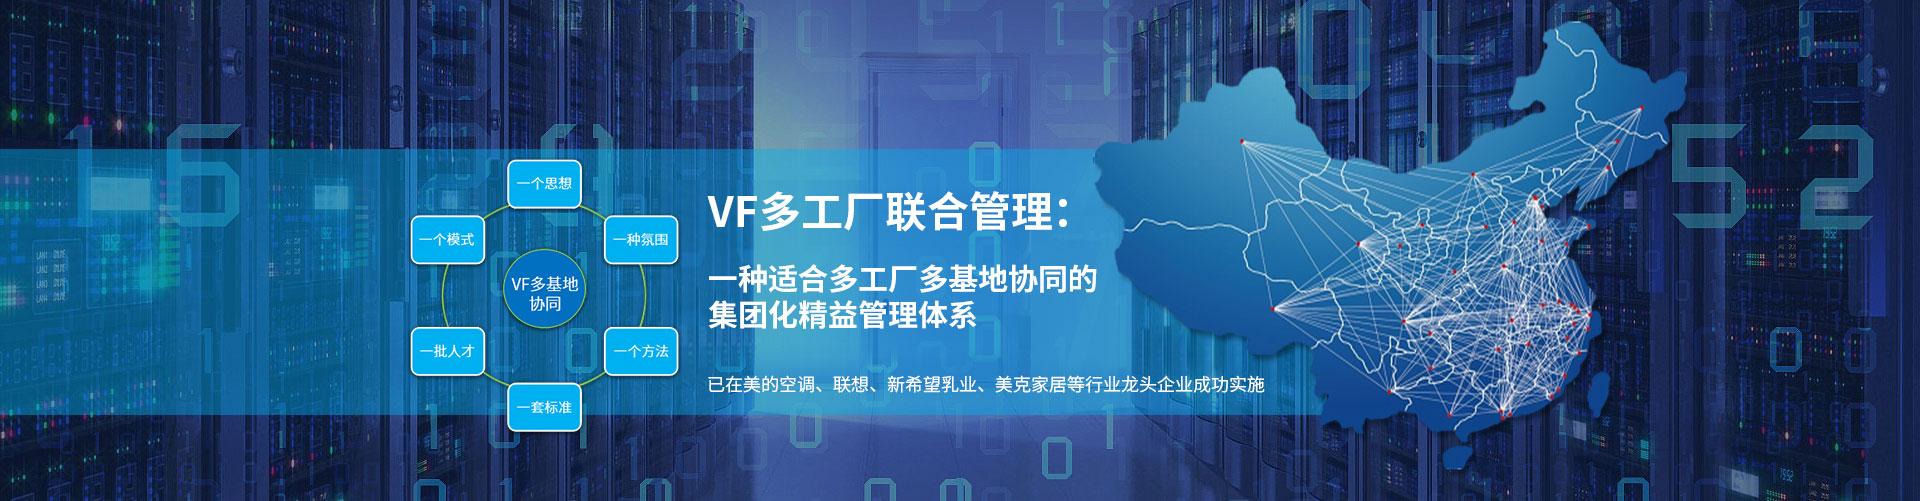 MES智能制造执行系统-数字化智能工厂-深圳数本科技